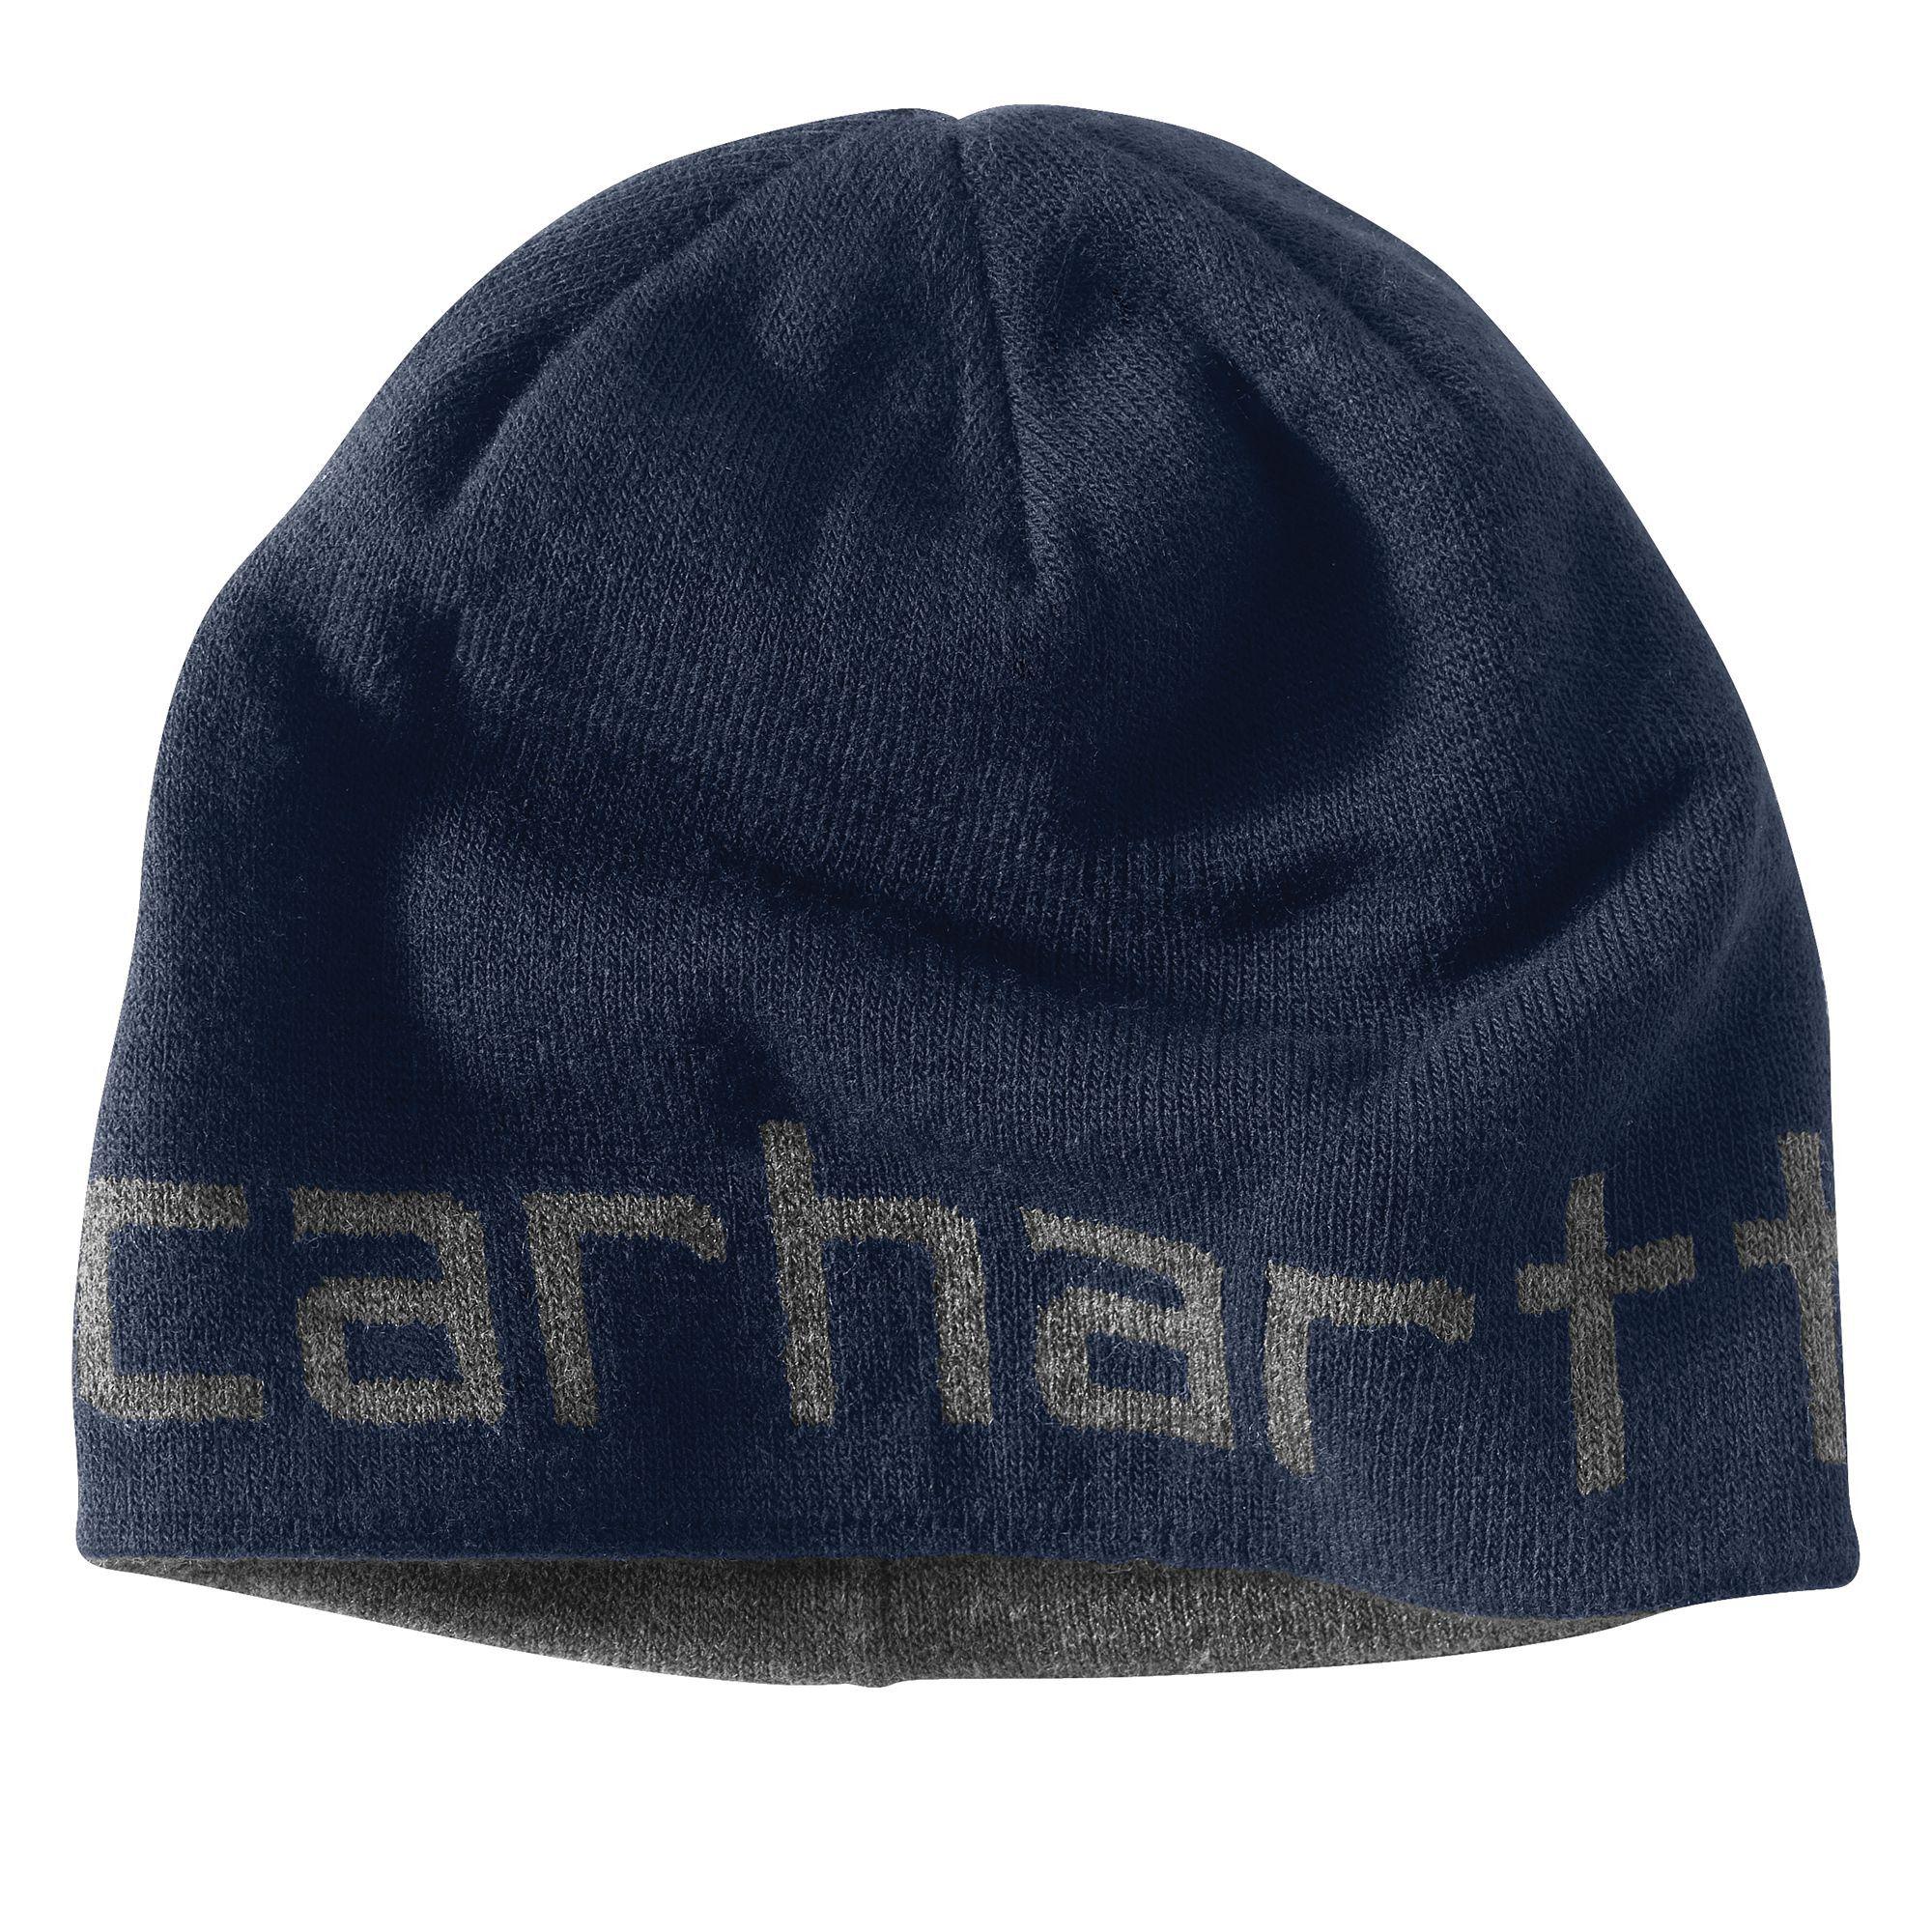 Carhartt Mens Greenfield Reversible Hat 100137 Navy